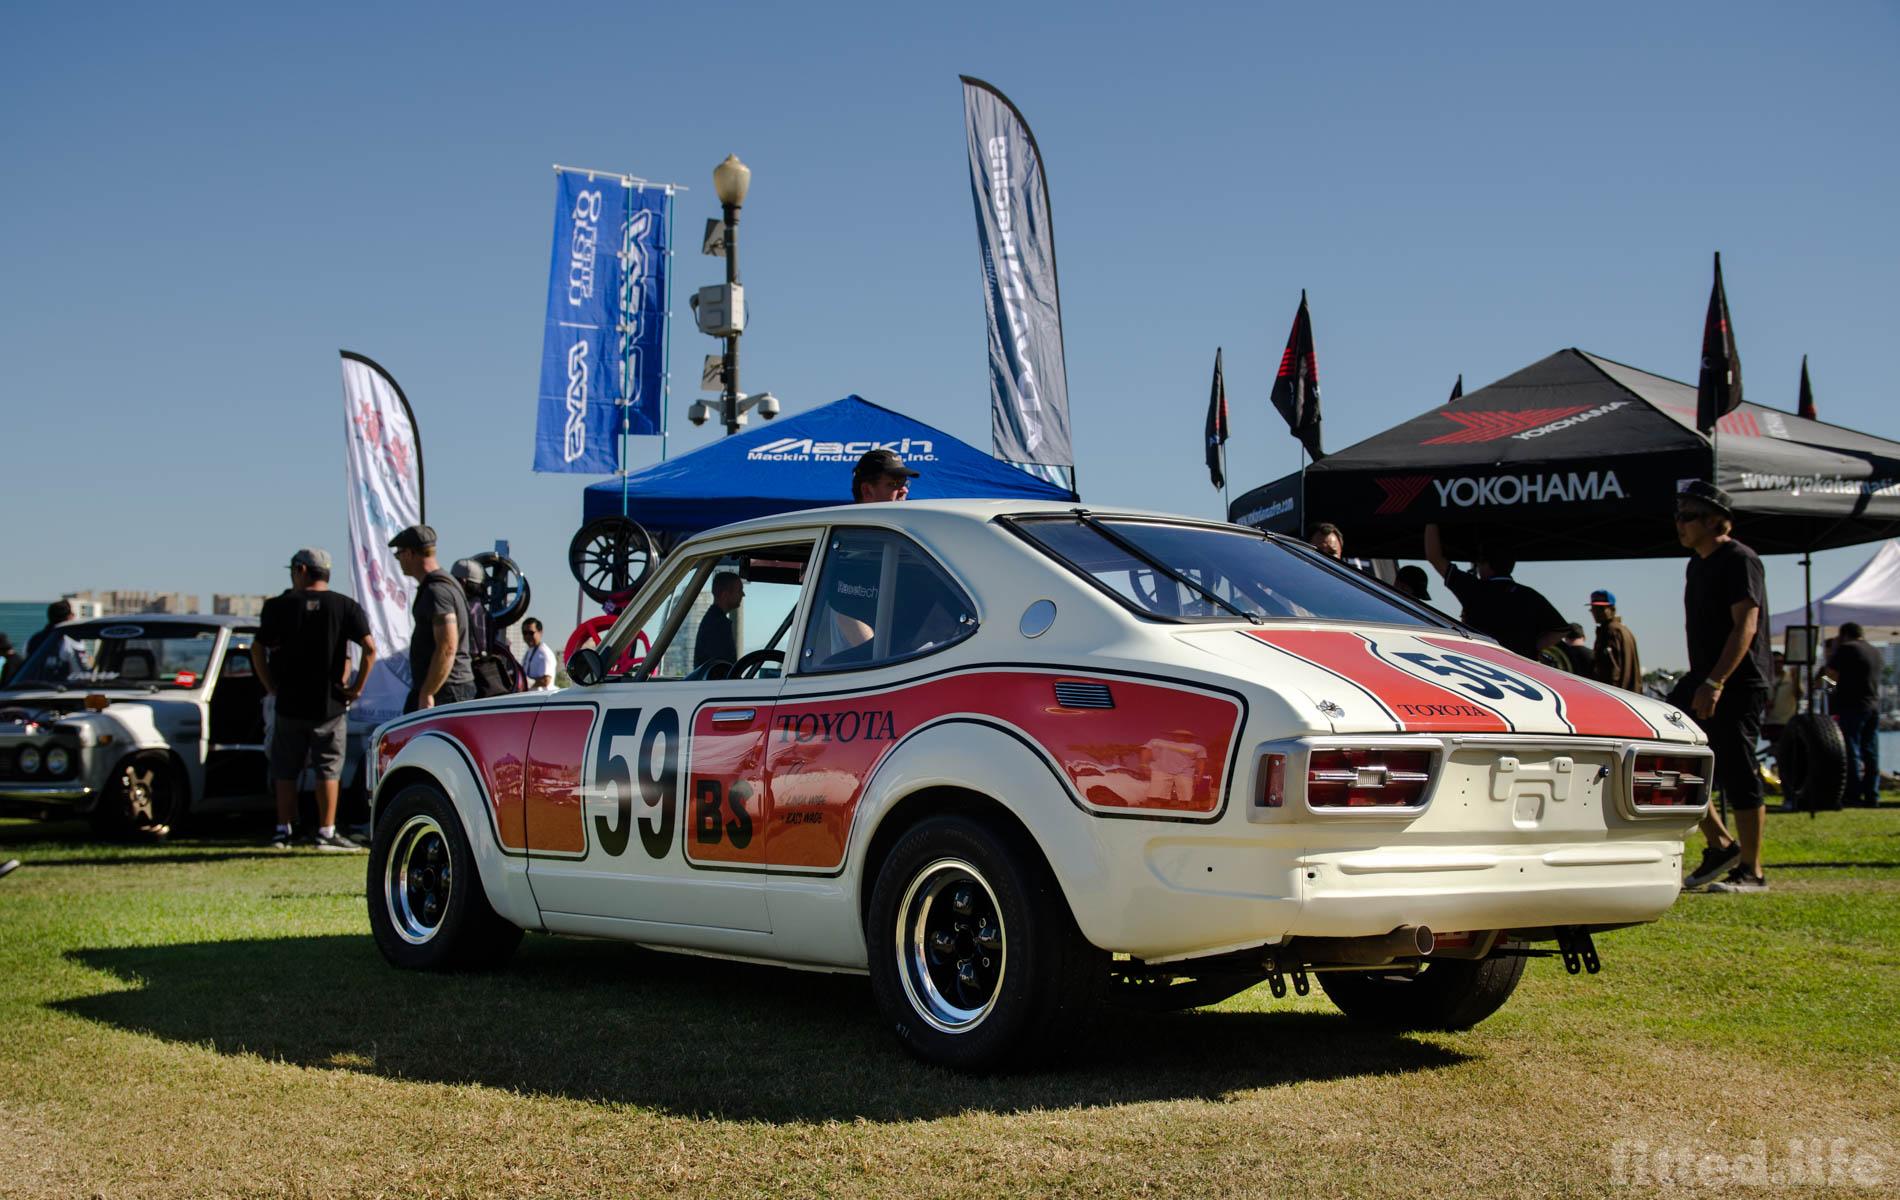 chasing-classics-at-jccs-2013-fittedlife6.jpg